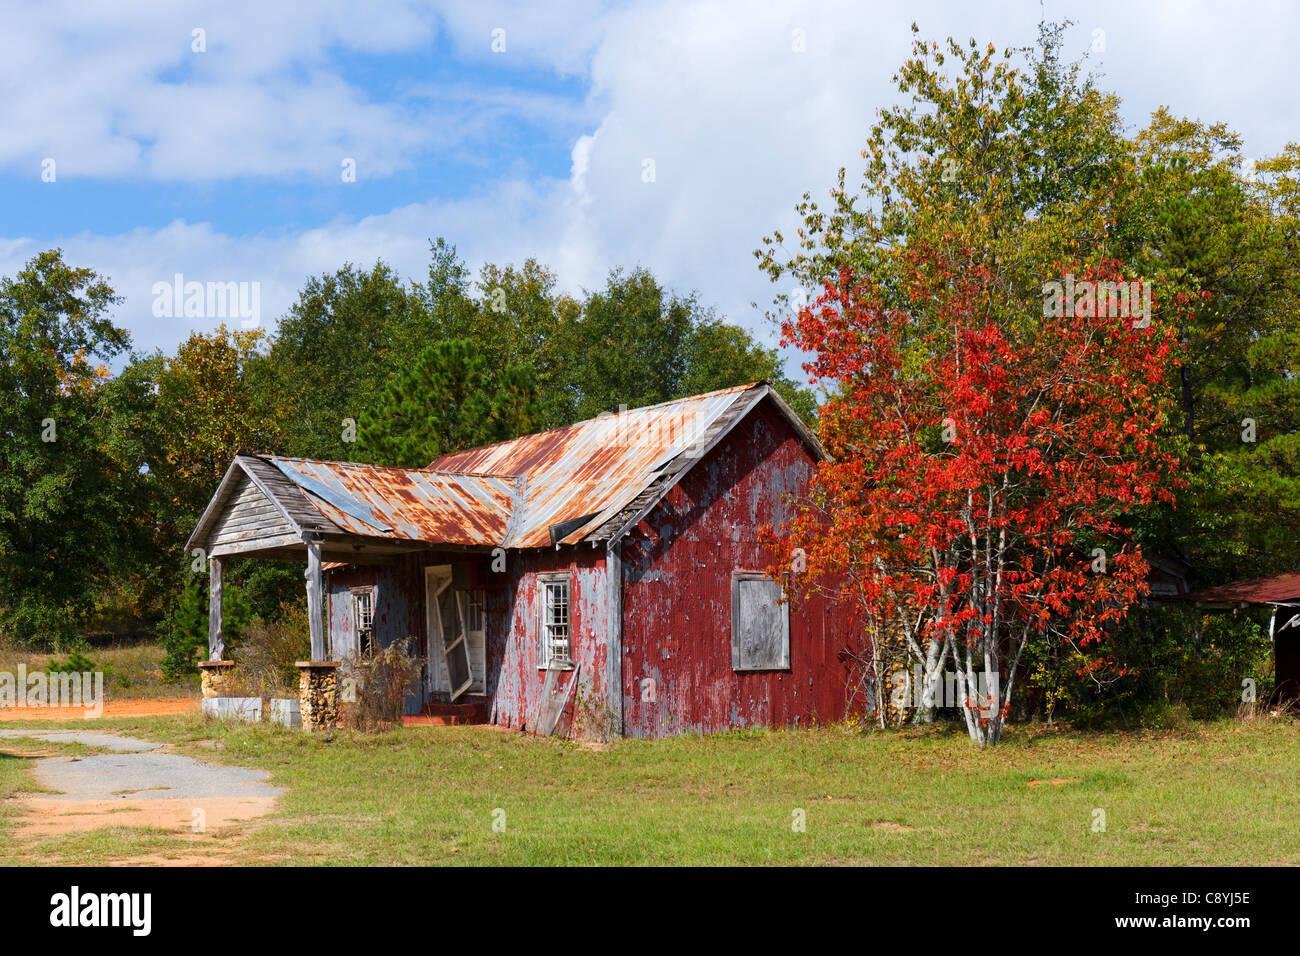 Dilapidated shack on Highway 280/27 outside Plains, Georgia, USA - Stock Image